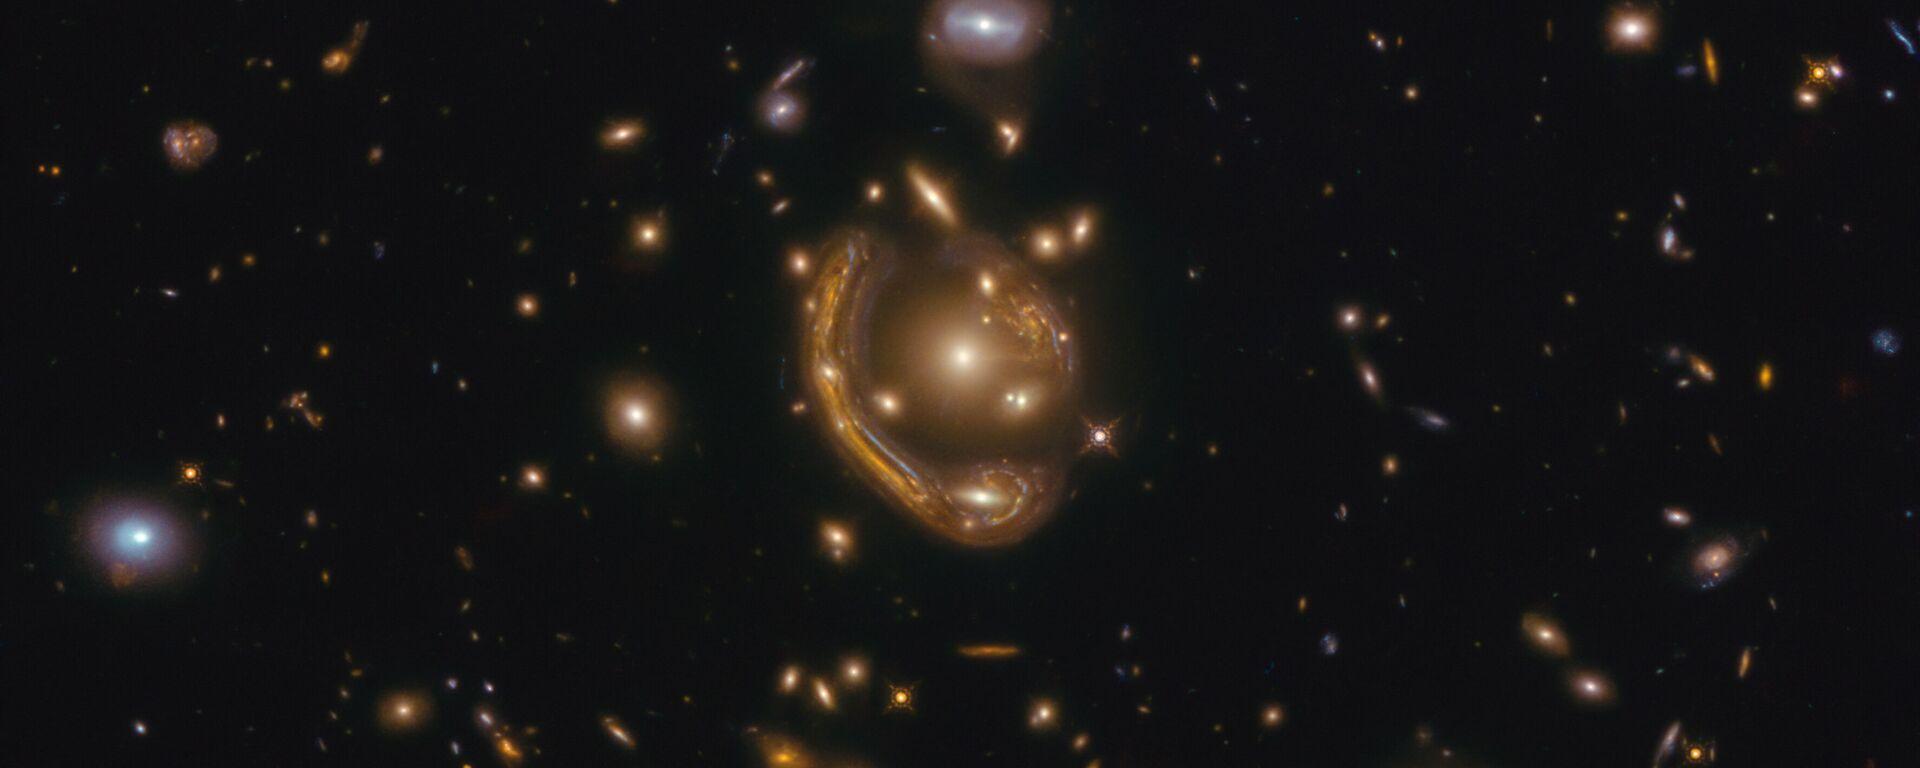 Галактика GAL-CLUS-022058s - Sputnik Česká republika, 1920, 10.05.2021